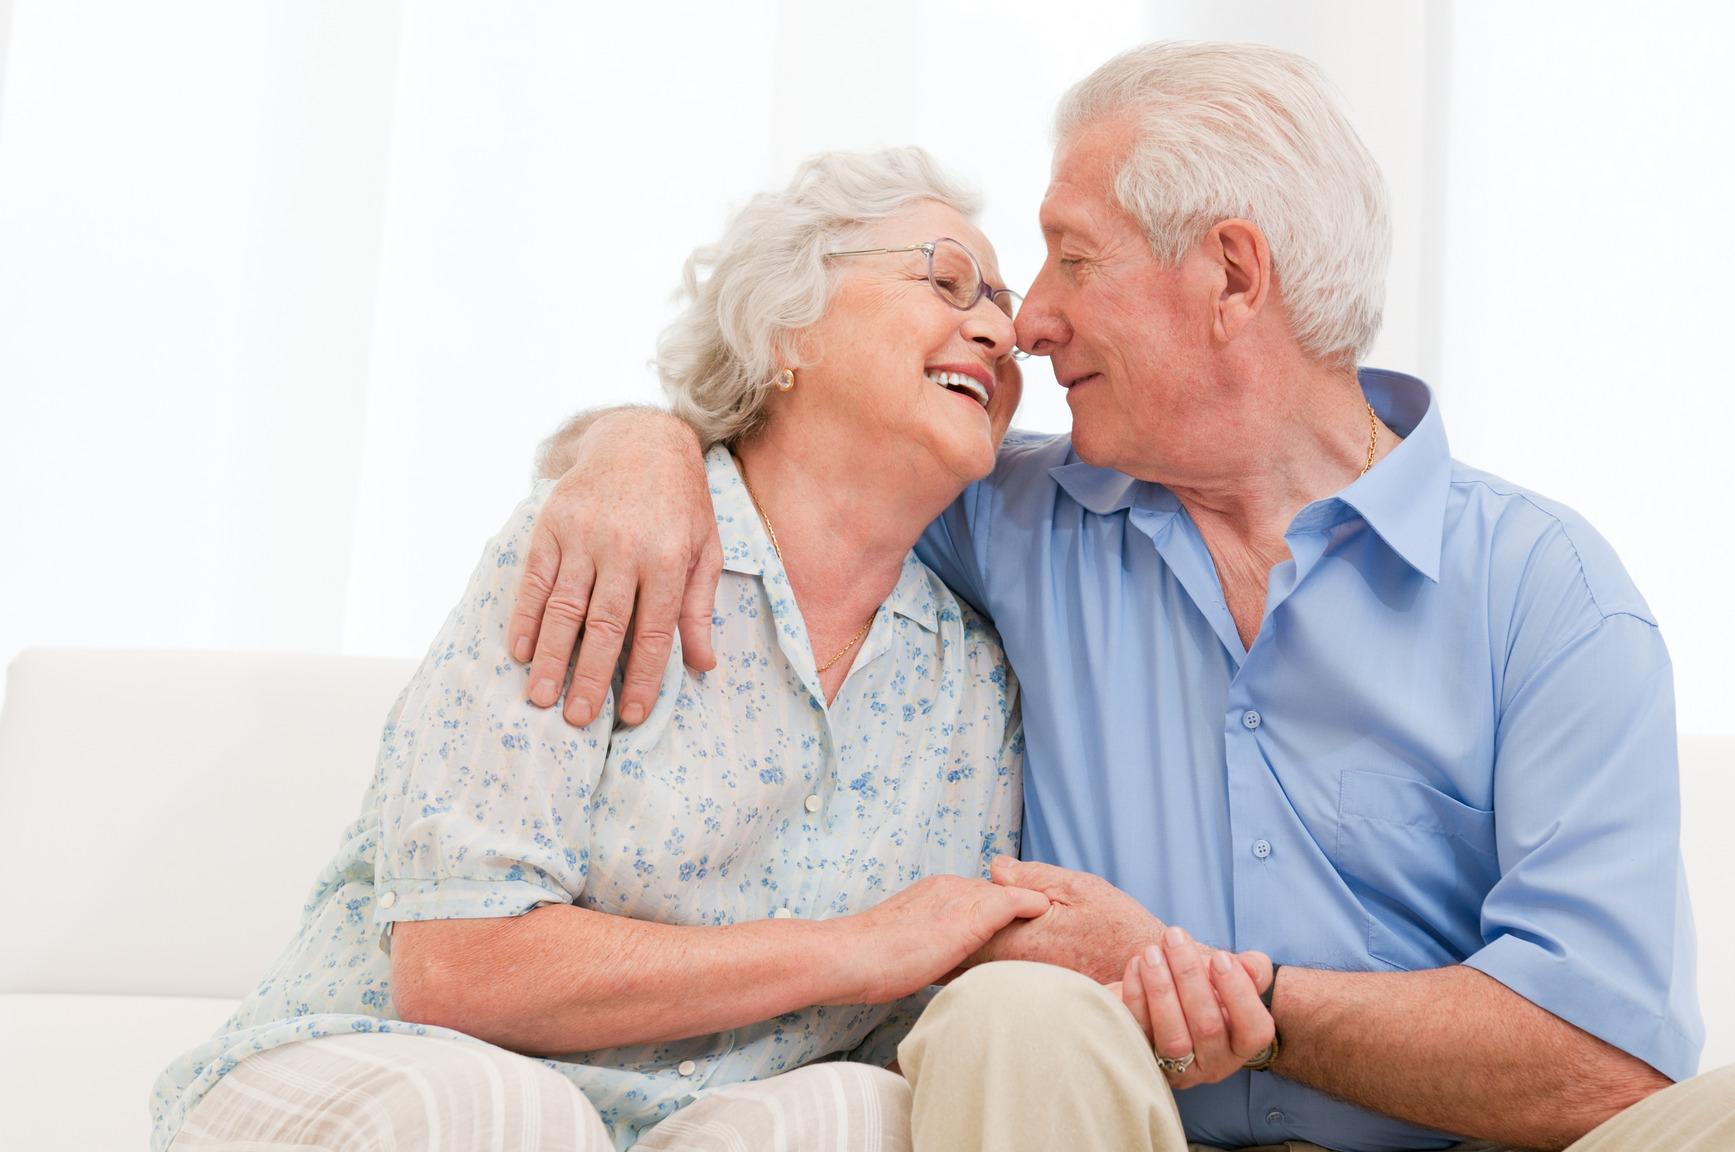 photodune-7164198-loving-senior-couple-m.jpg